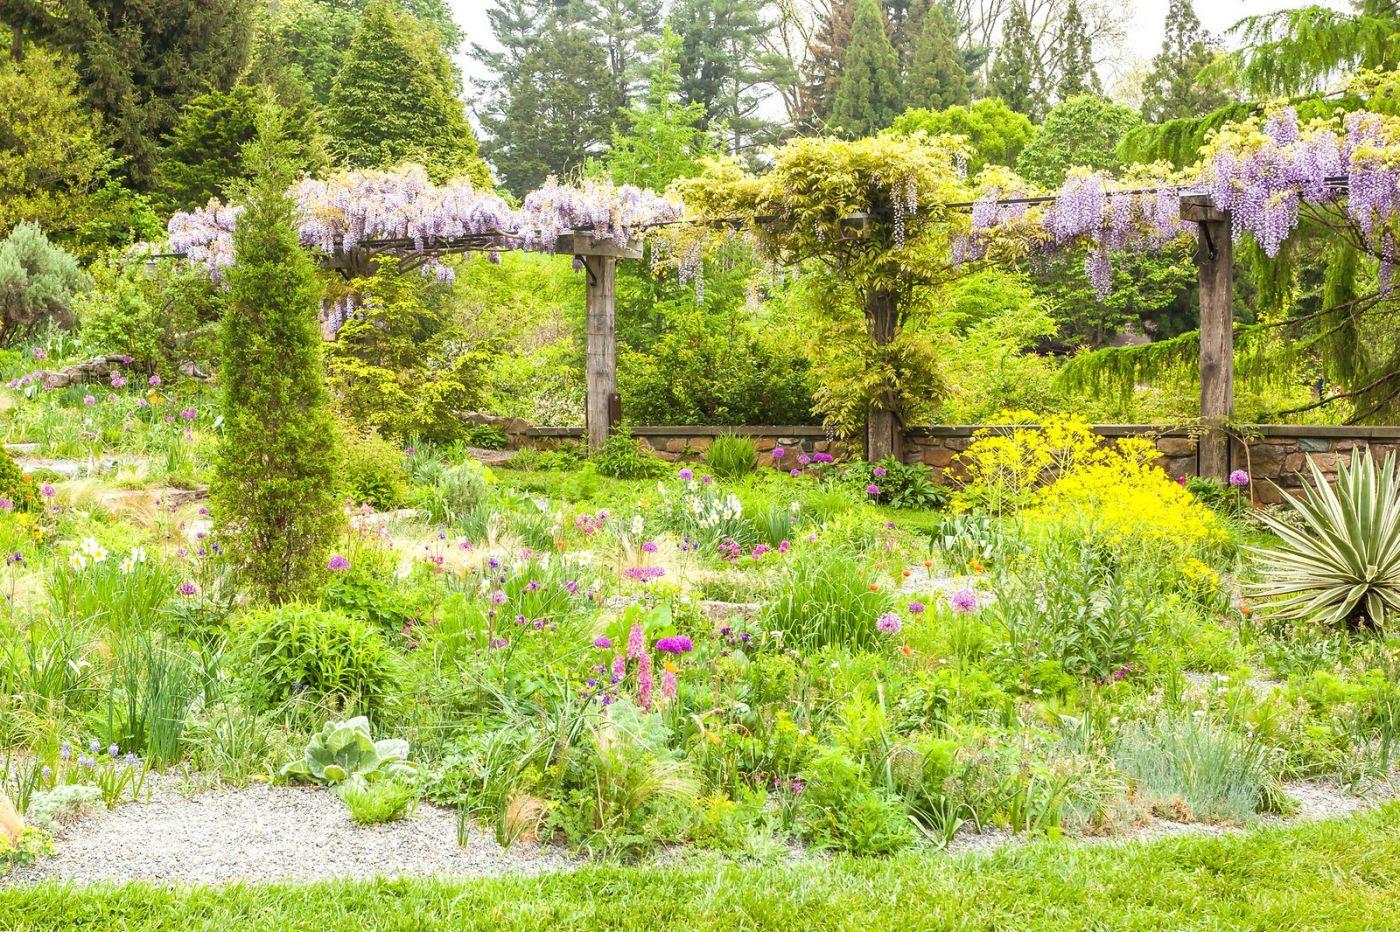 Chanticleer花园,那年盛开的紫藤花_图1-18